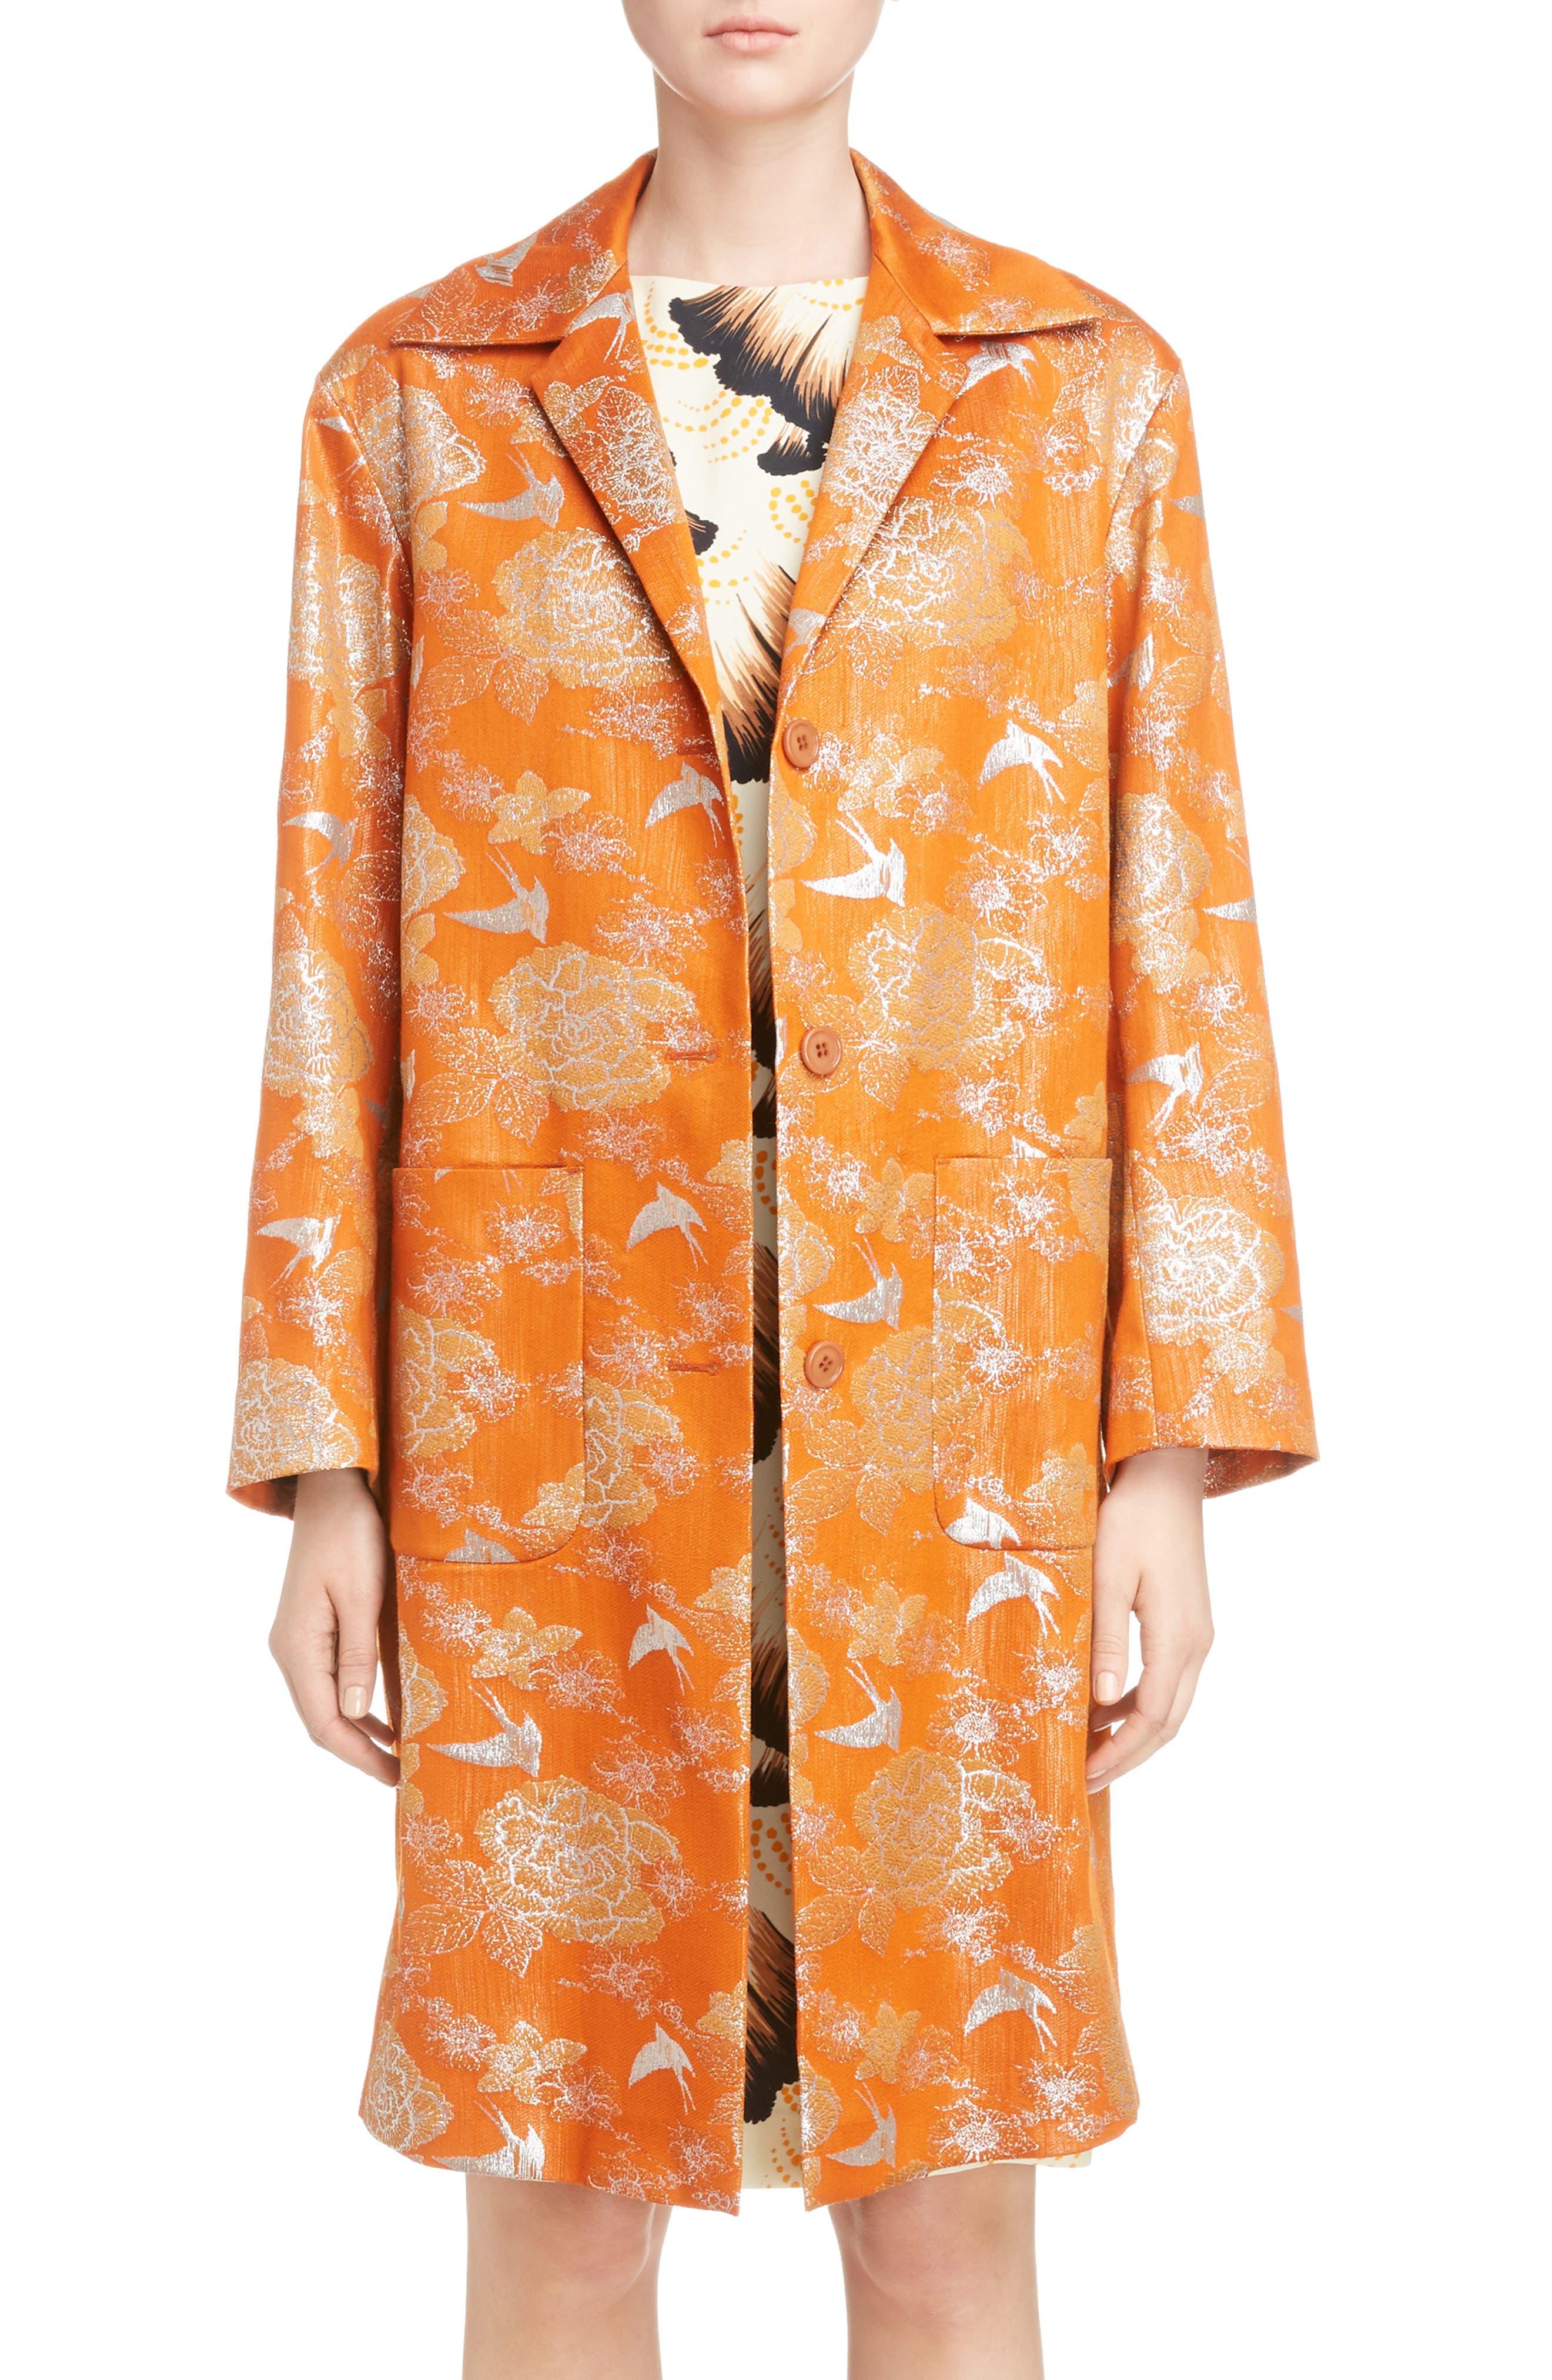 Silver Bird Jacquard Coat,                         Main,                         color, Orange